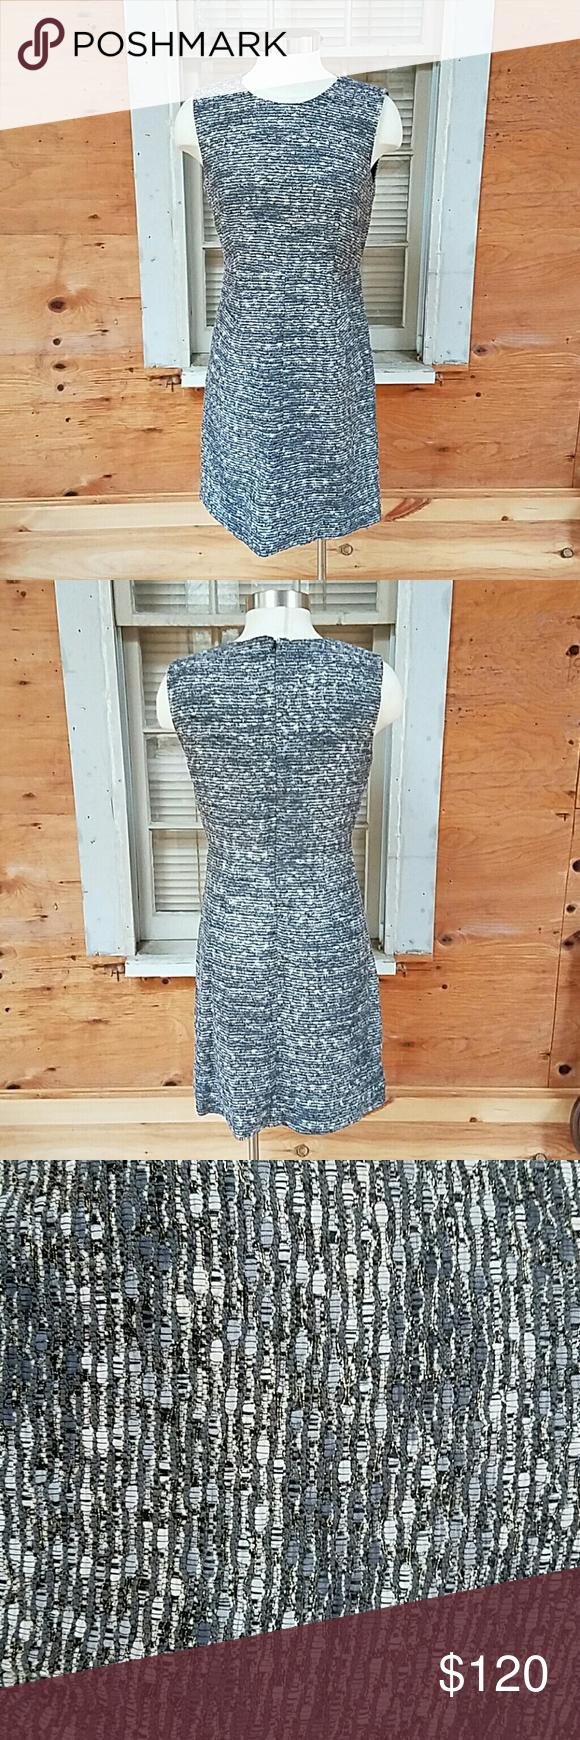 DVF dress Beautiful grey/silver dress in excellent condition with side pockets. Diane von Furstenberg Dresses Midi